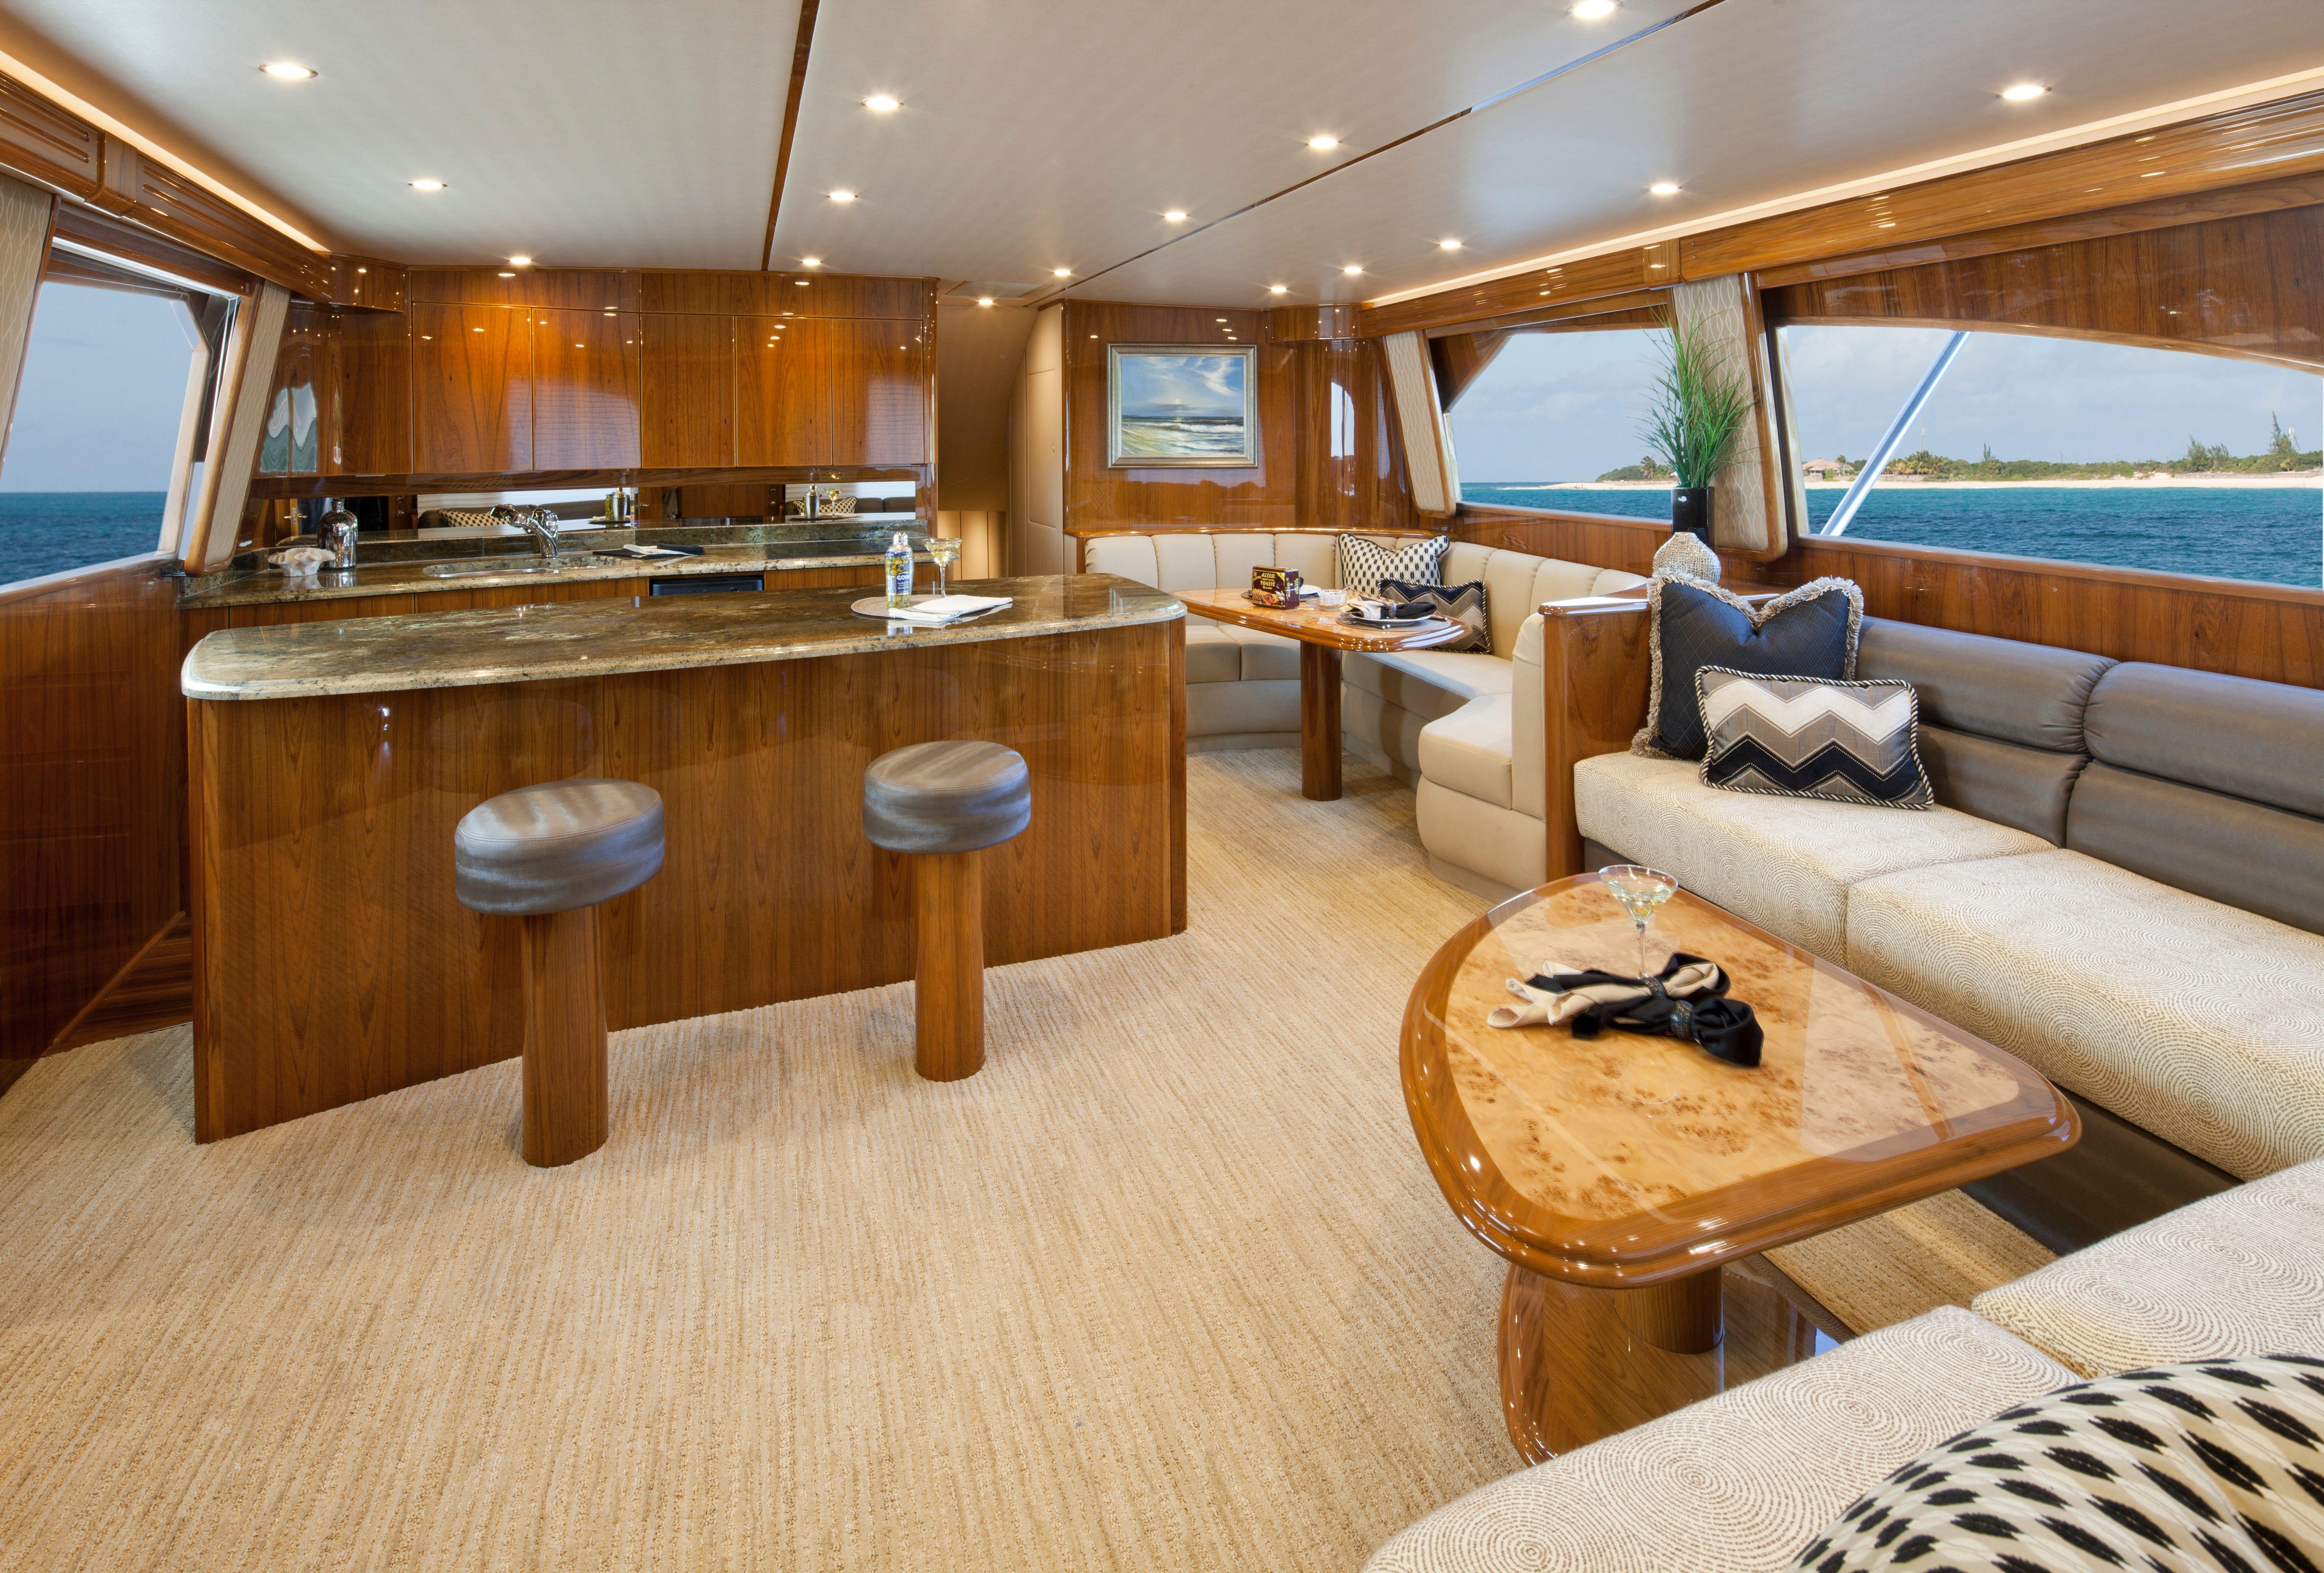 Viking Yachts Range Between $1 And $9 Million. Take A Peek Inside The U201csalon